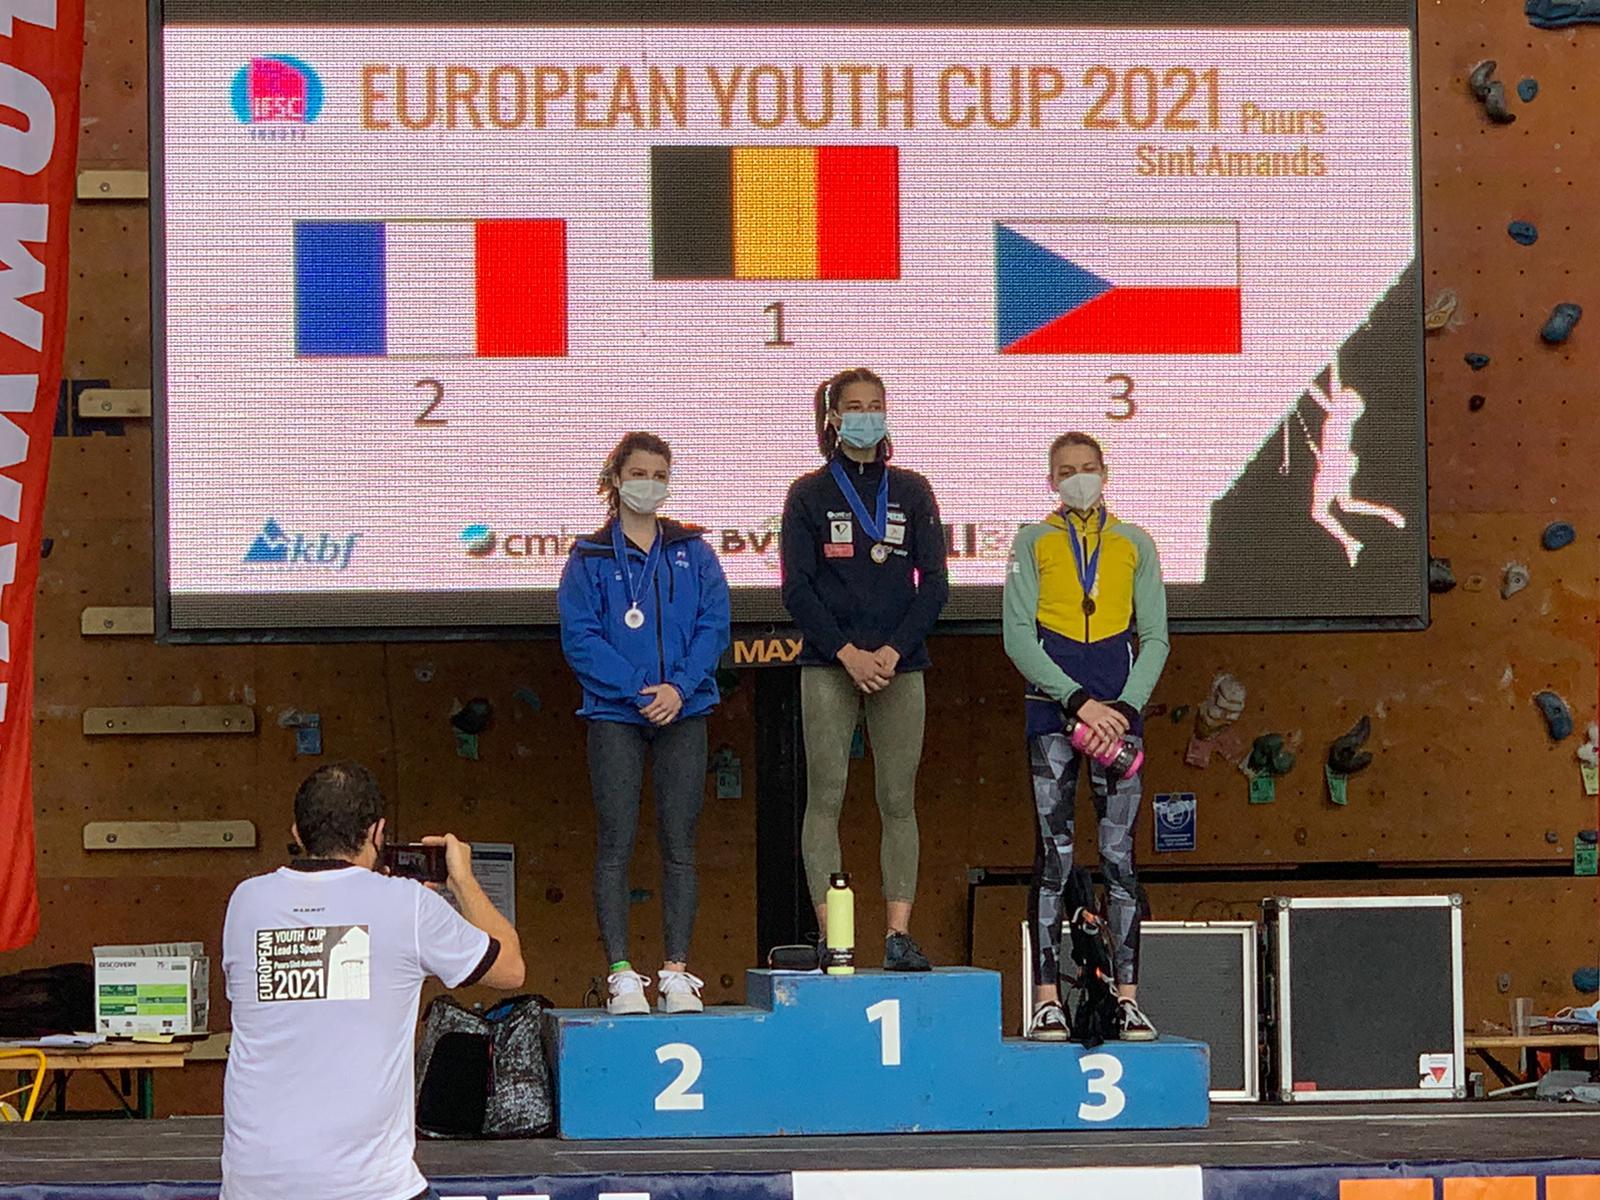 Coupe d'Europe Jeune Puurs 2021